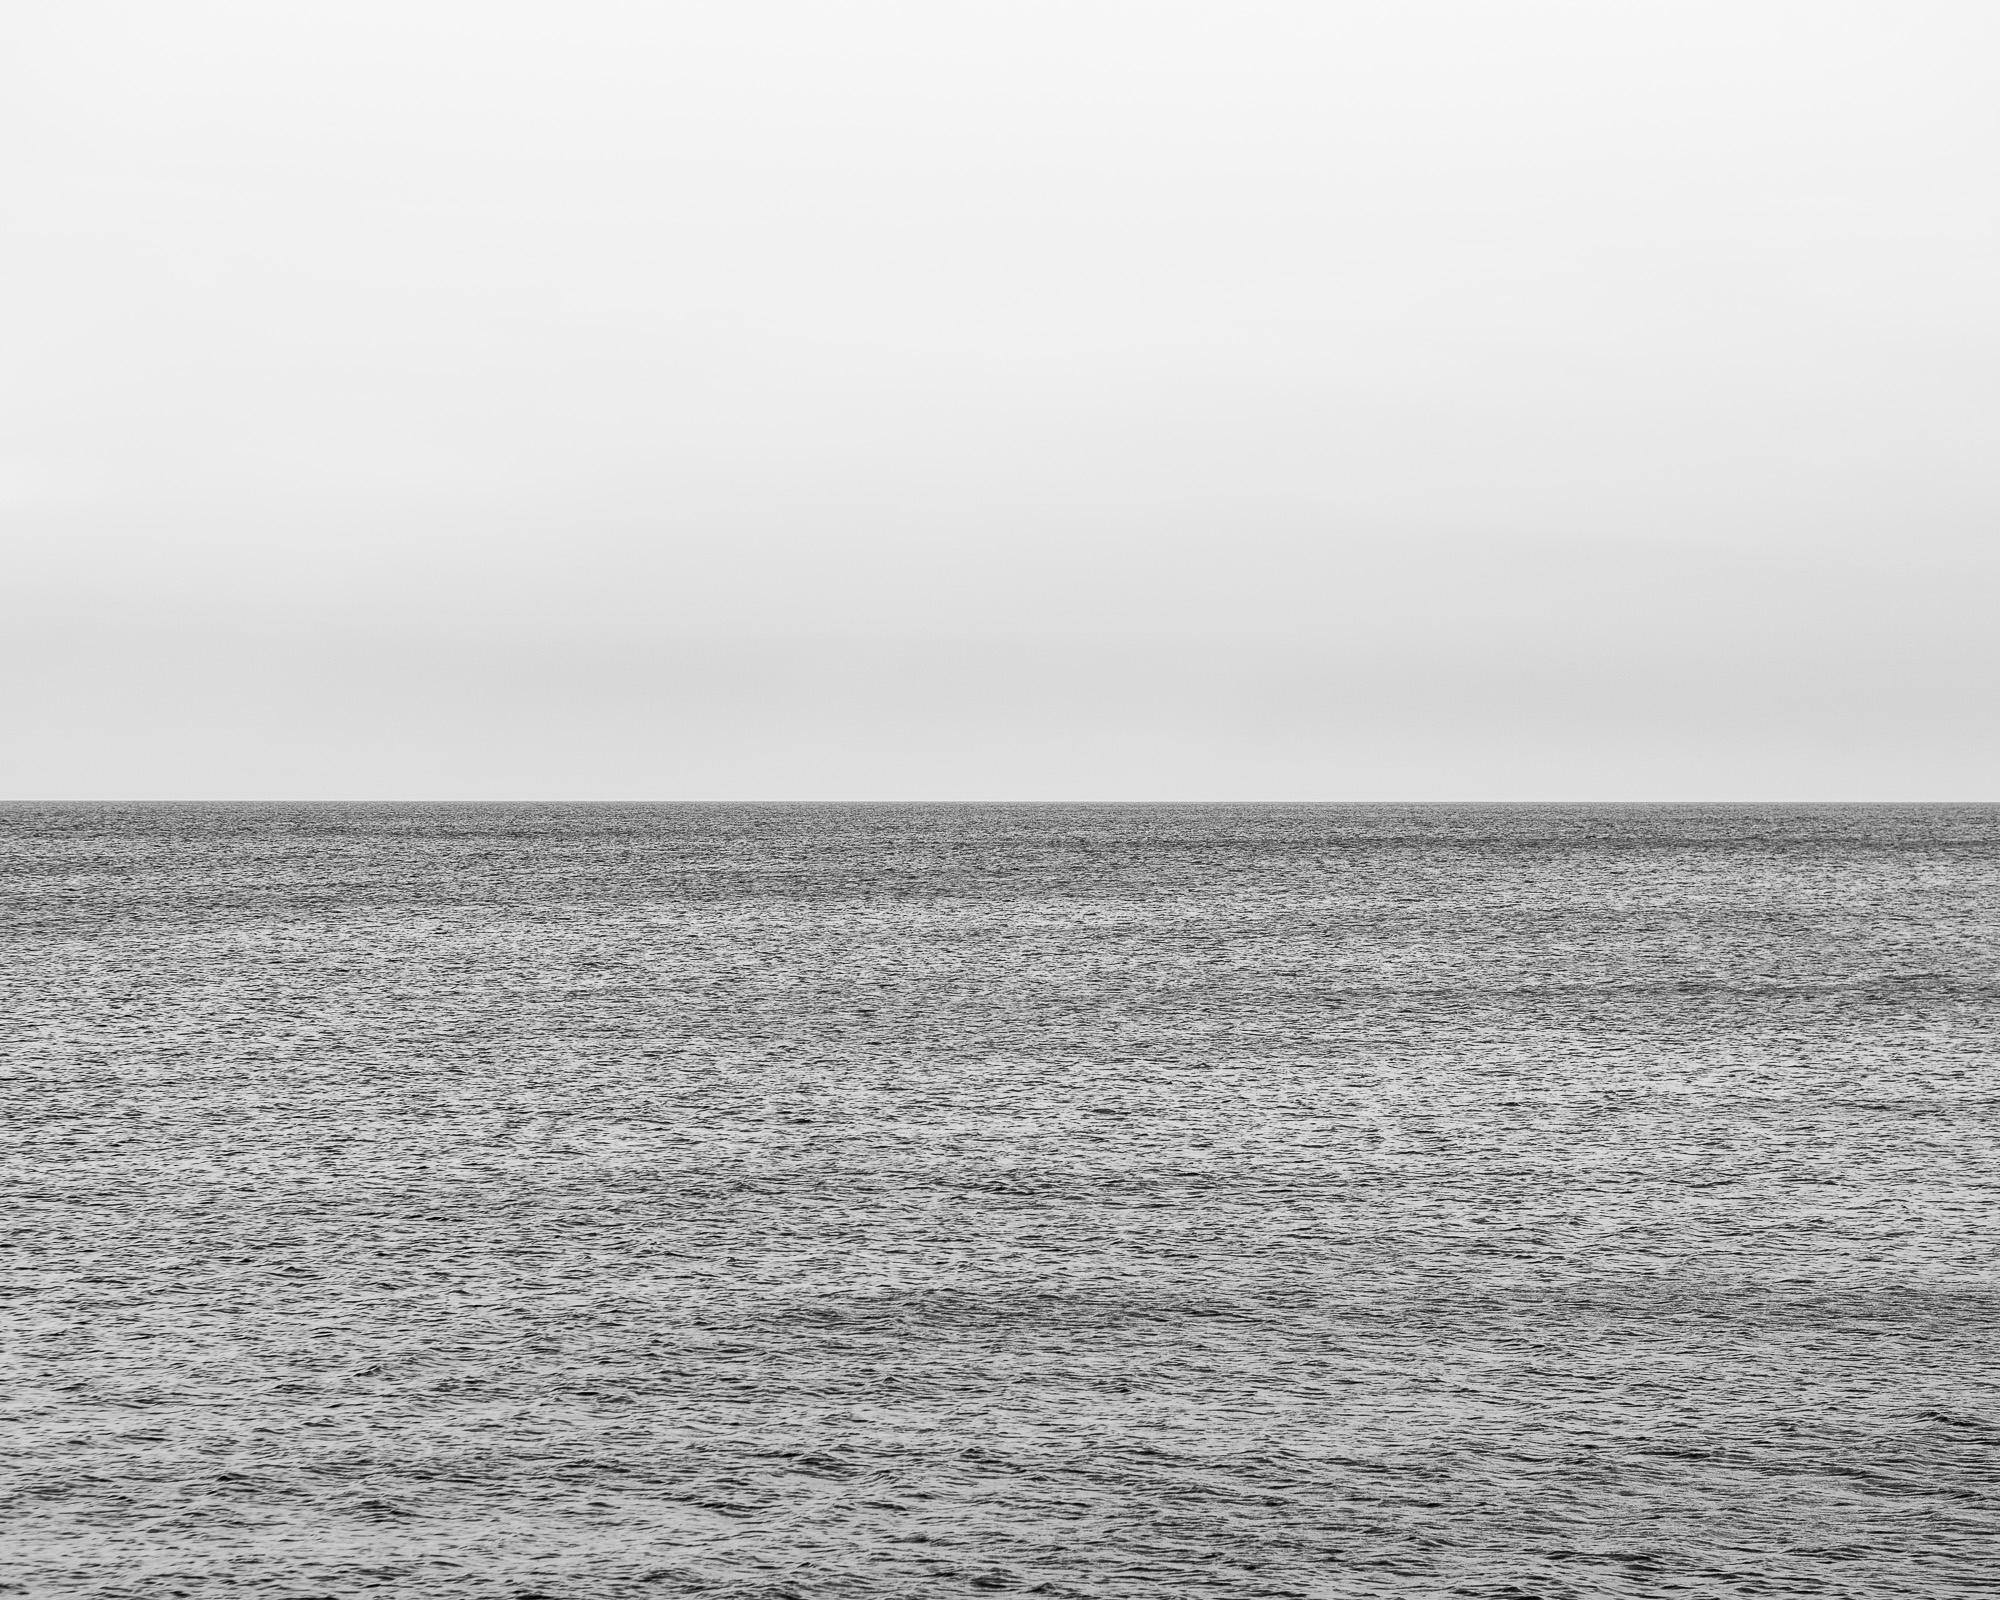 Seascape, Rügen 2014